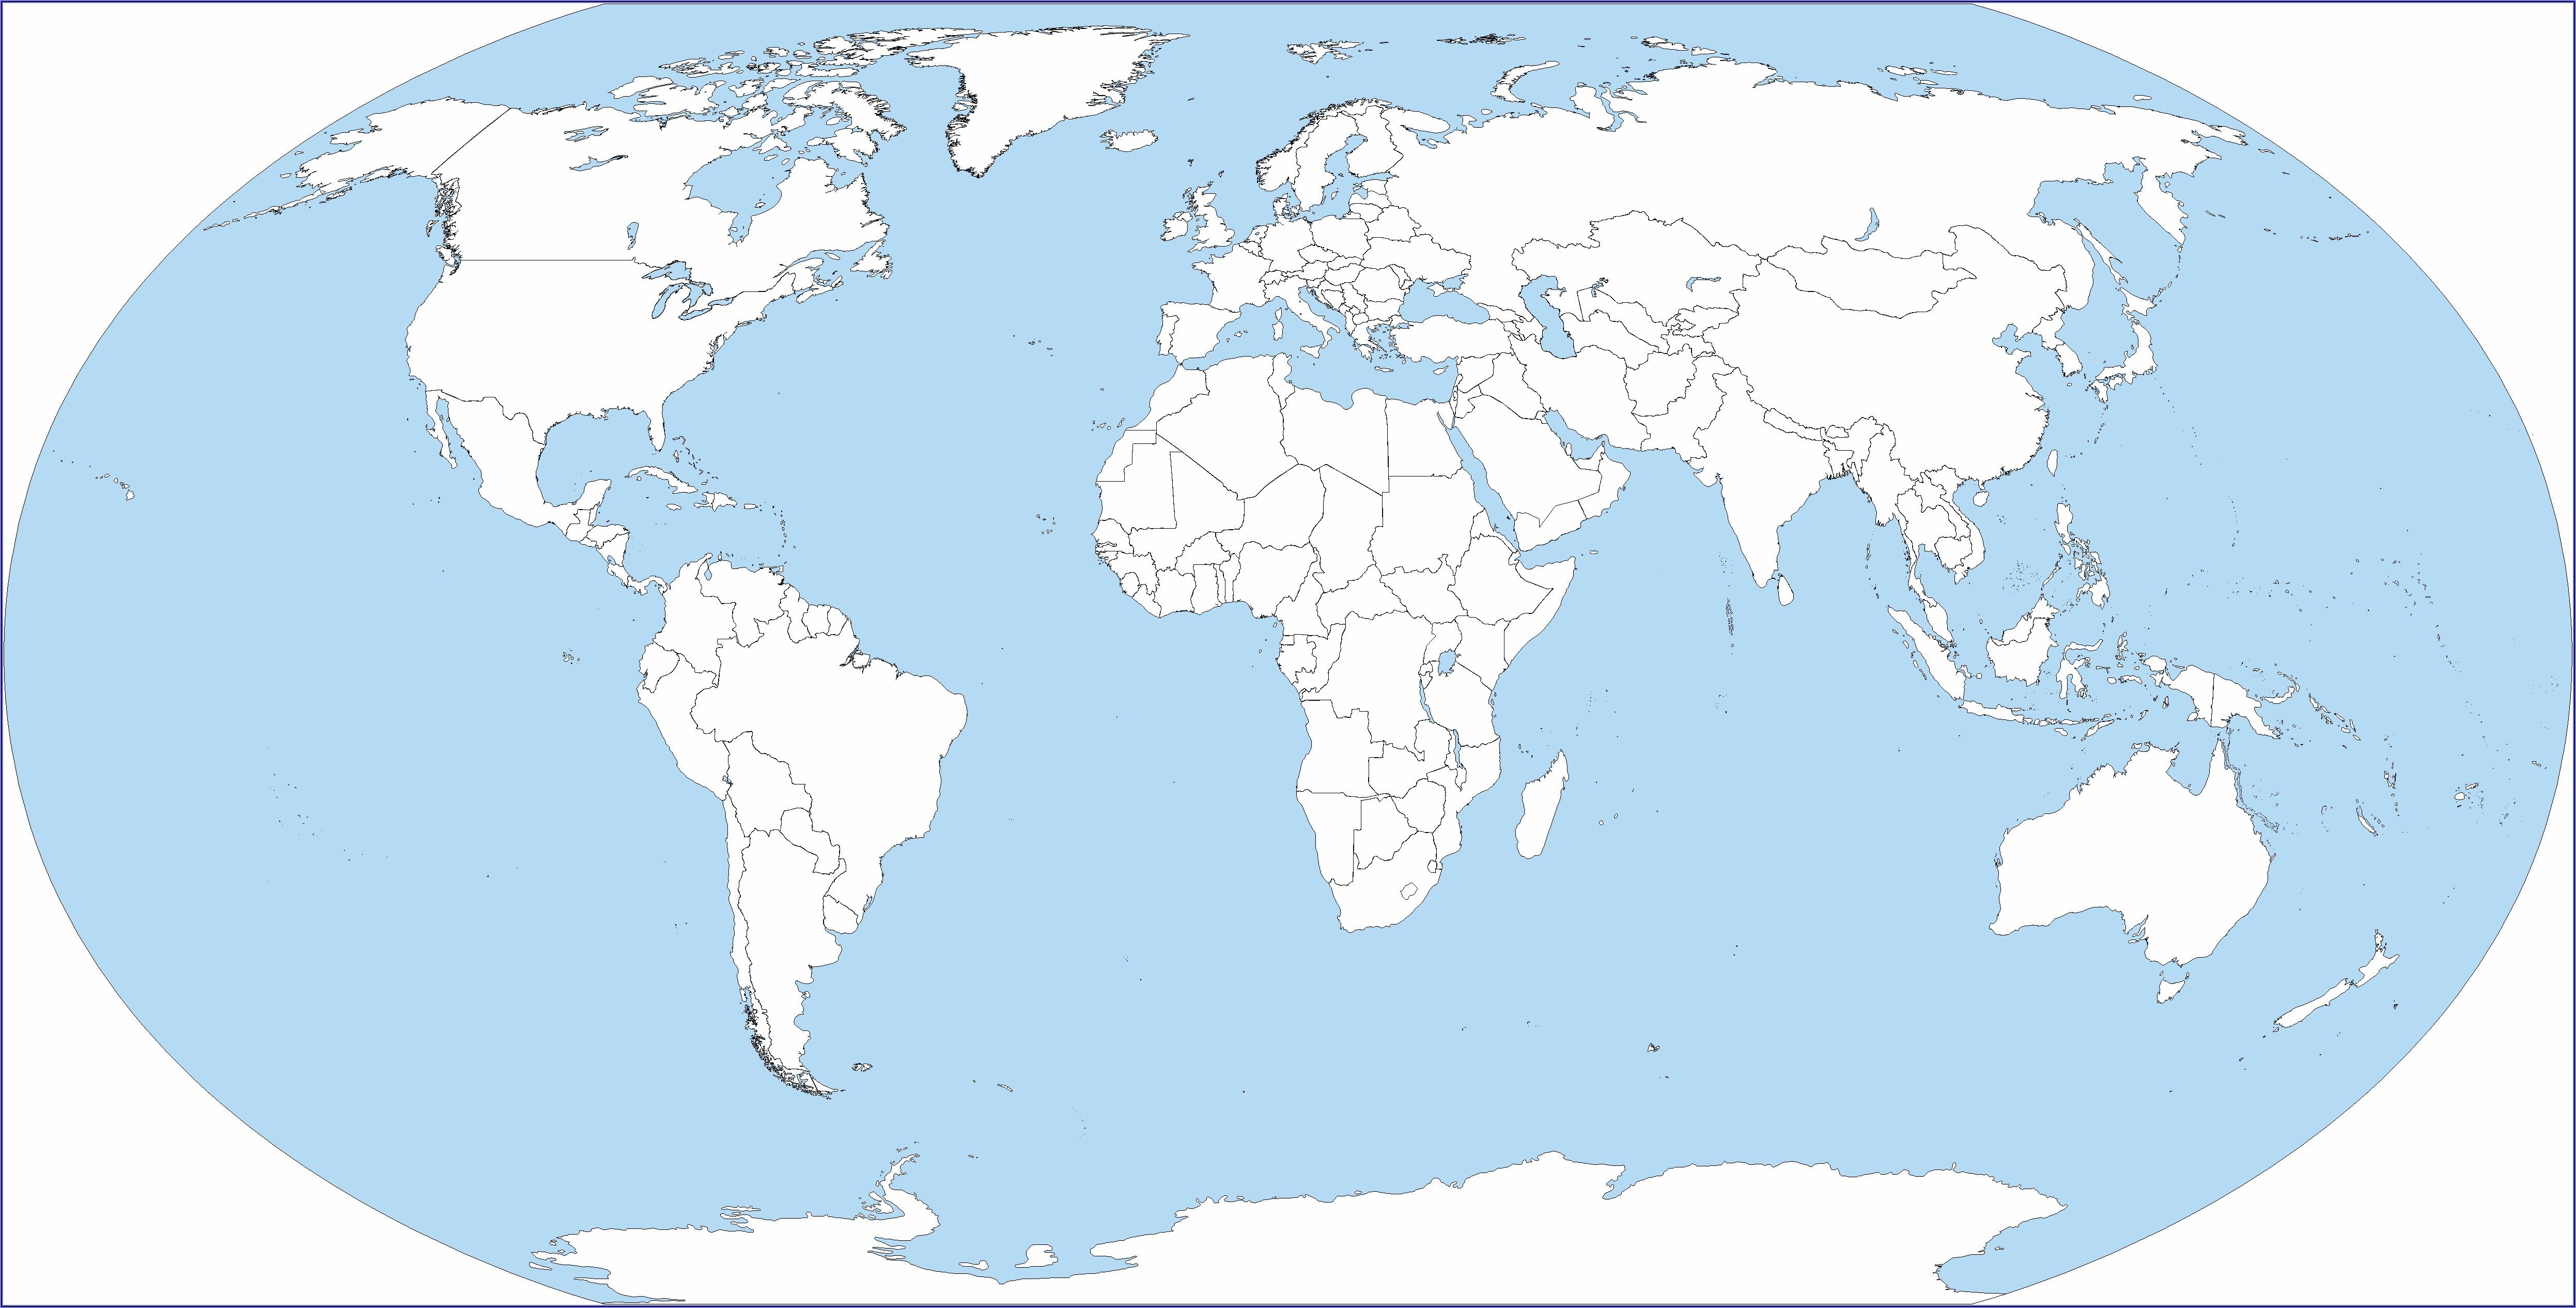 Big Blank World Map